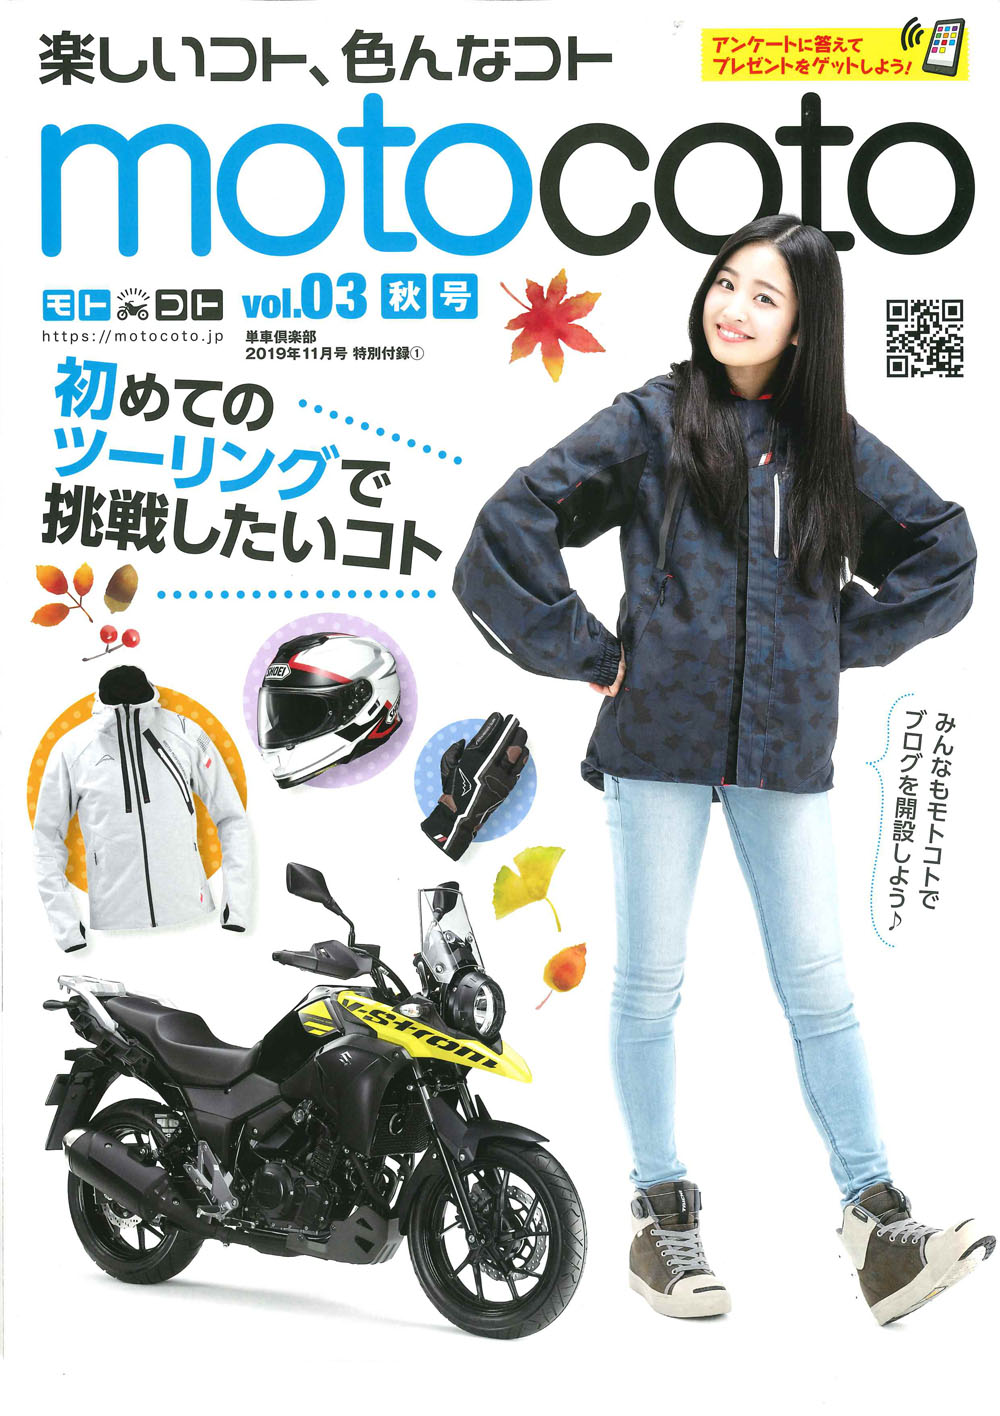 【motocoto vol.03掲載】 SB6X製品紹介